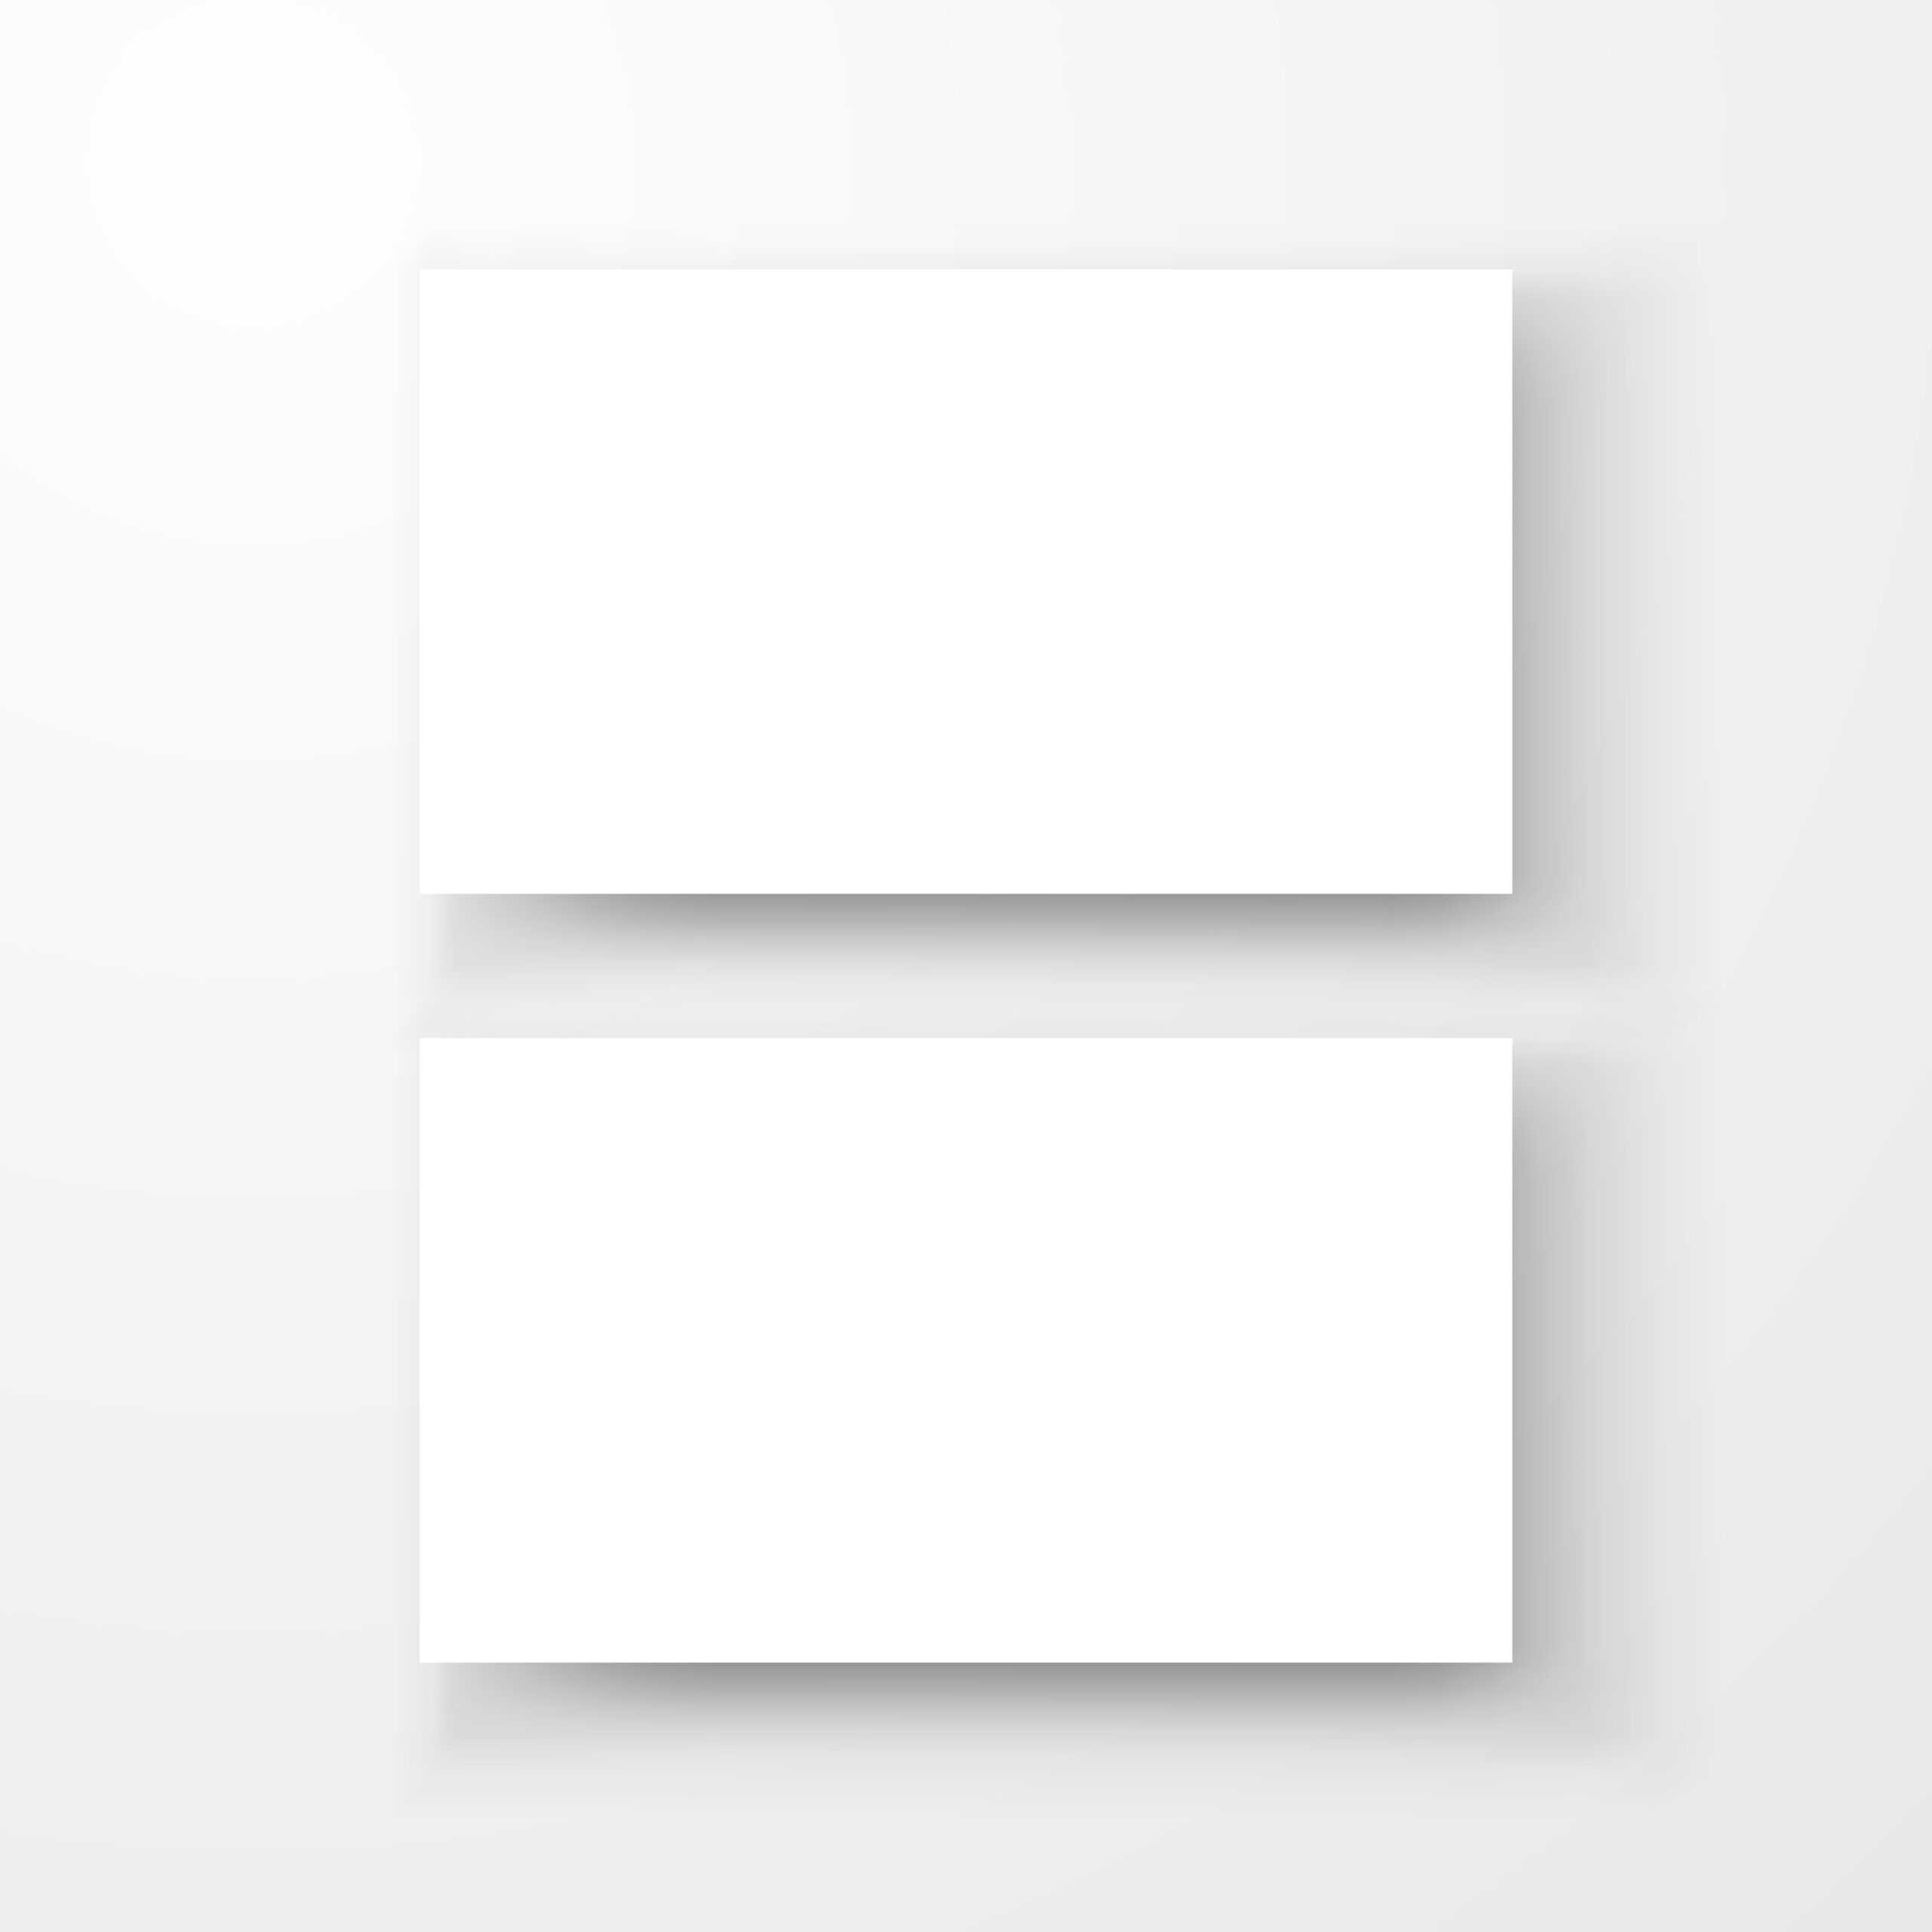 Blank Business Card Mockup Template Createdvector Intended For Blank Business Card Template Download